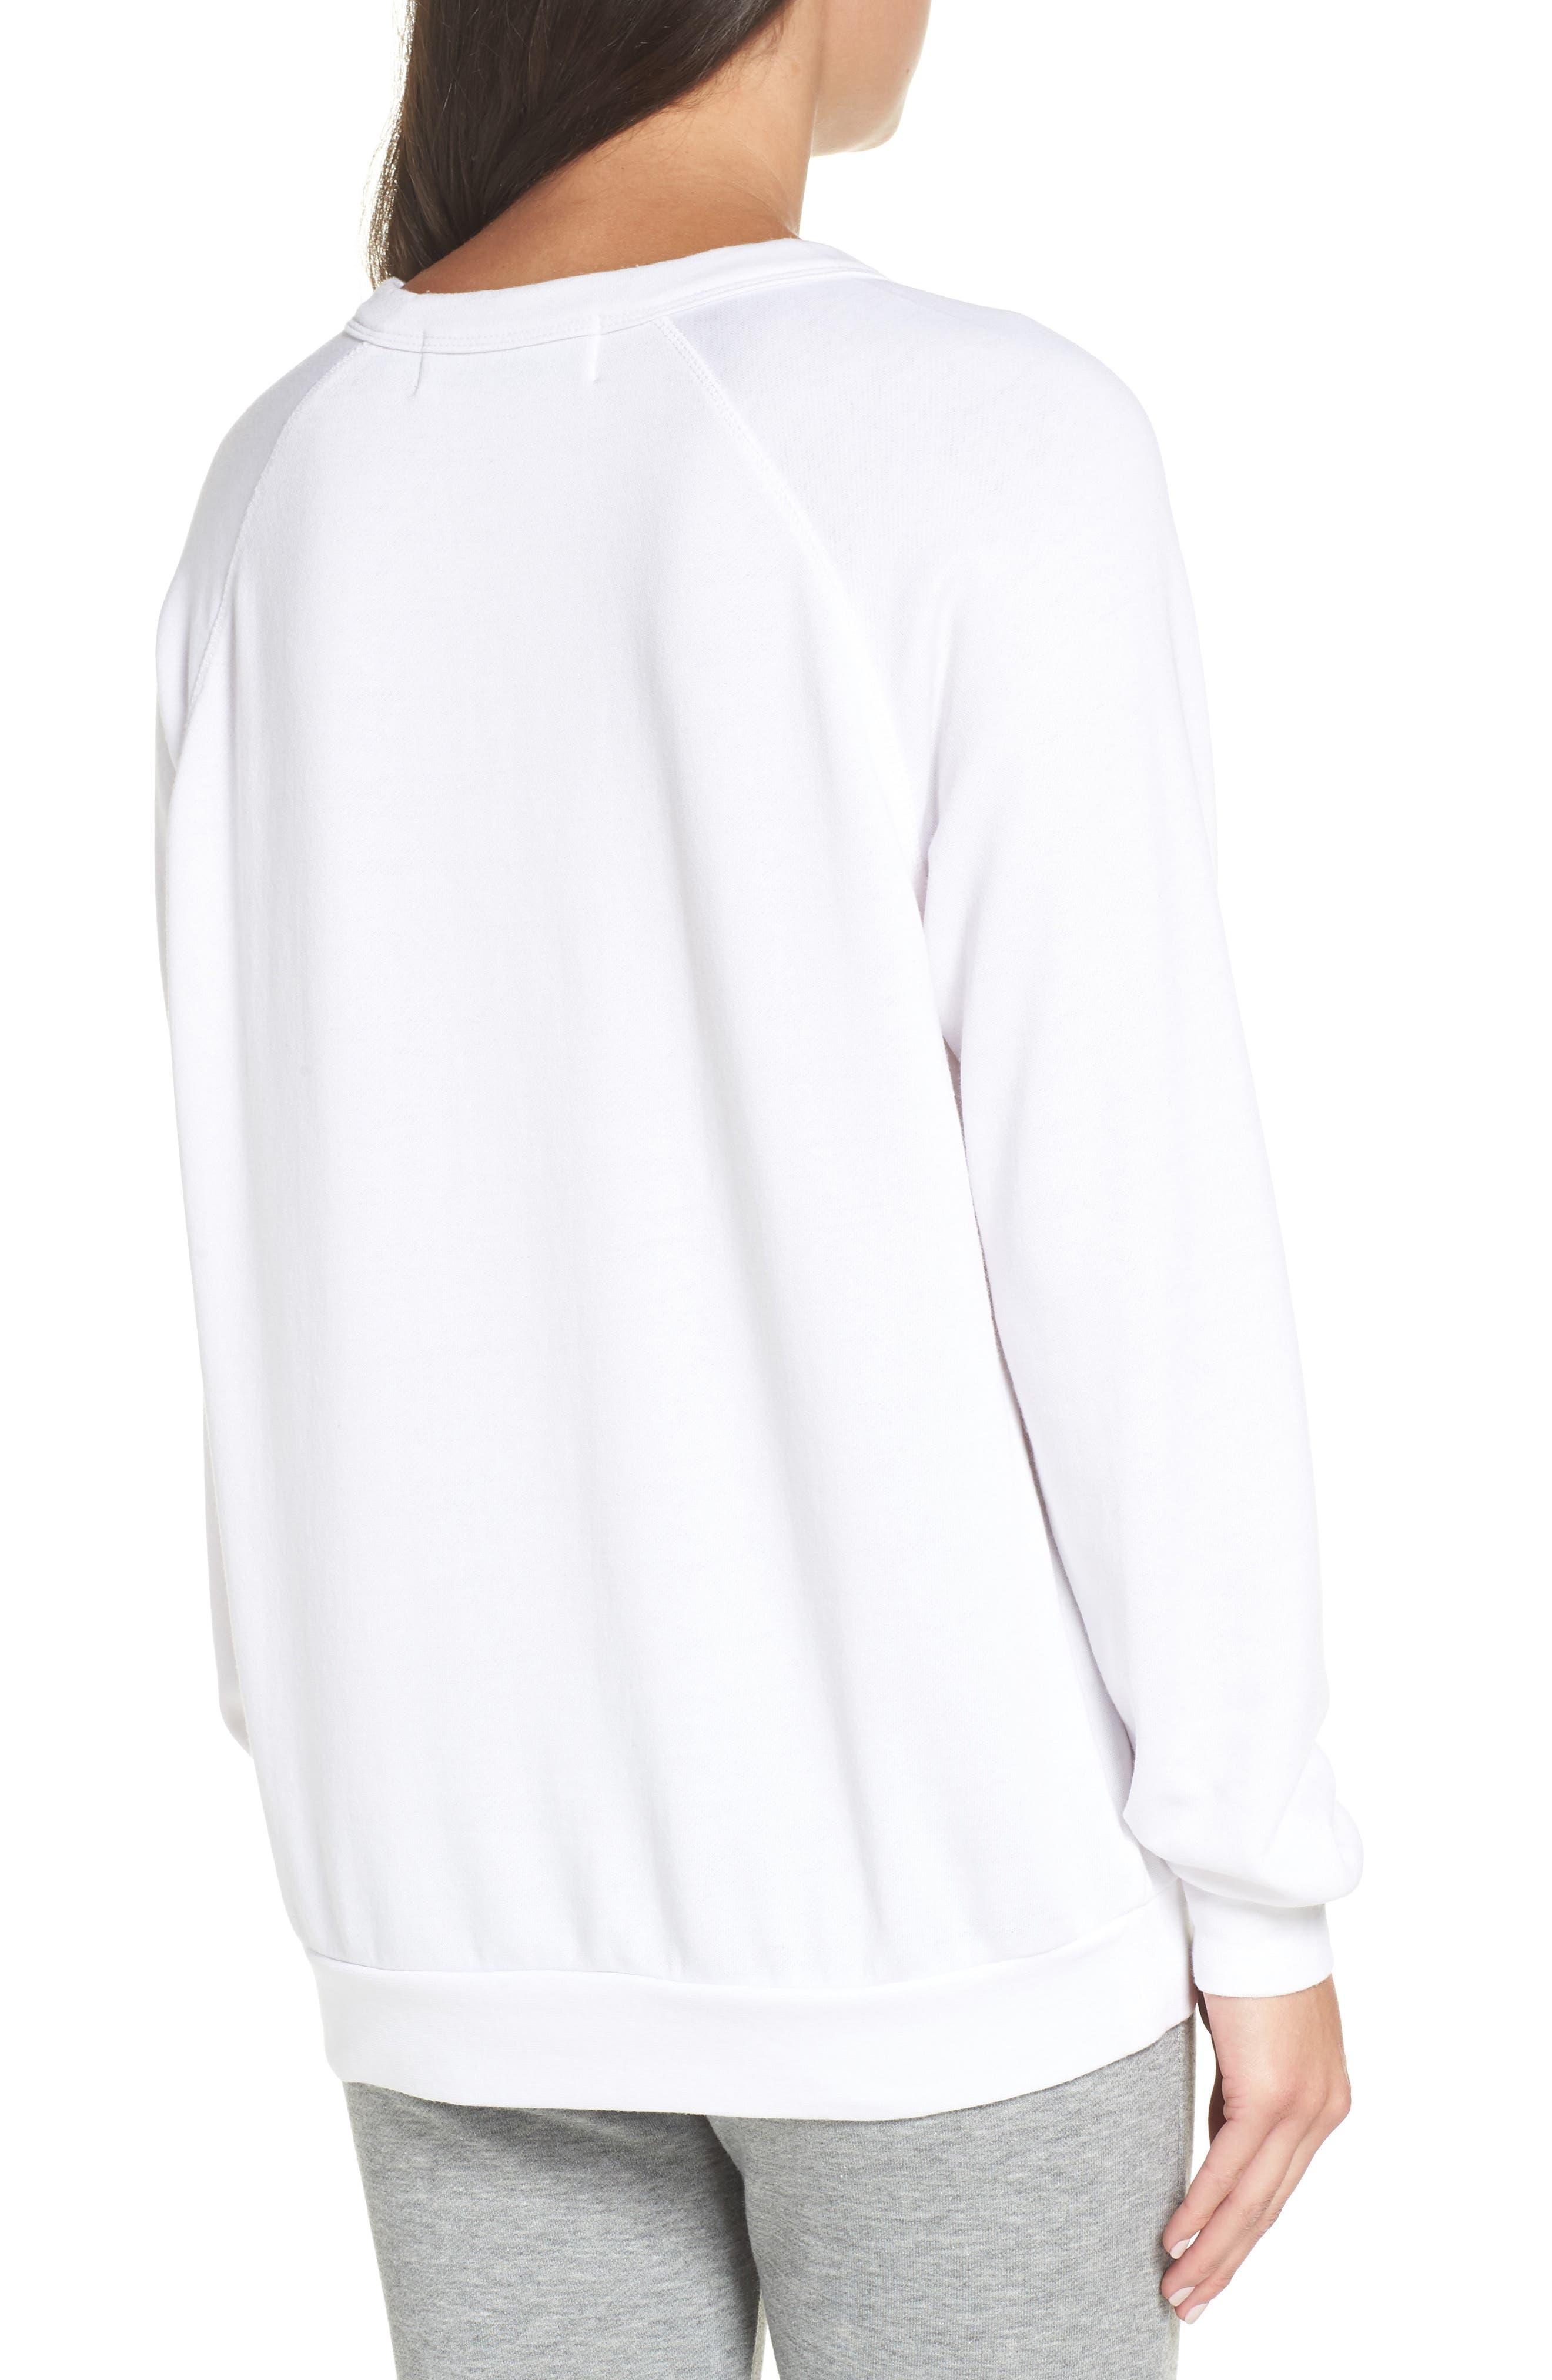 Priority Female Sweatshirt,                             Alternate thumbnail 2, color,                             WHITE